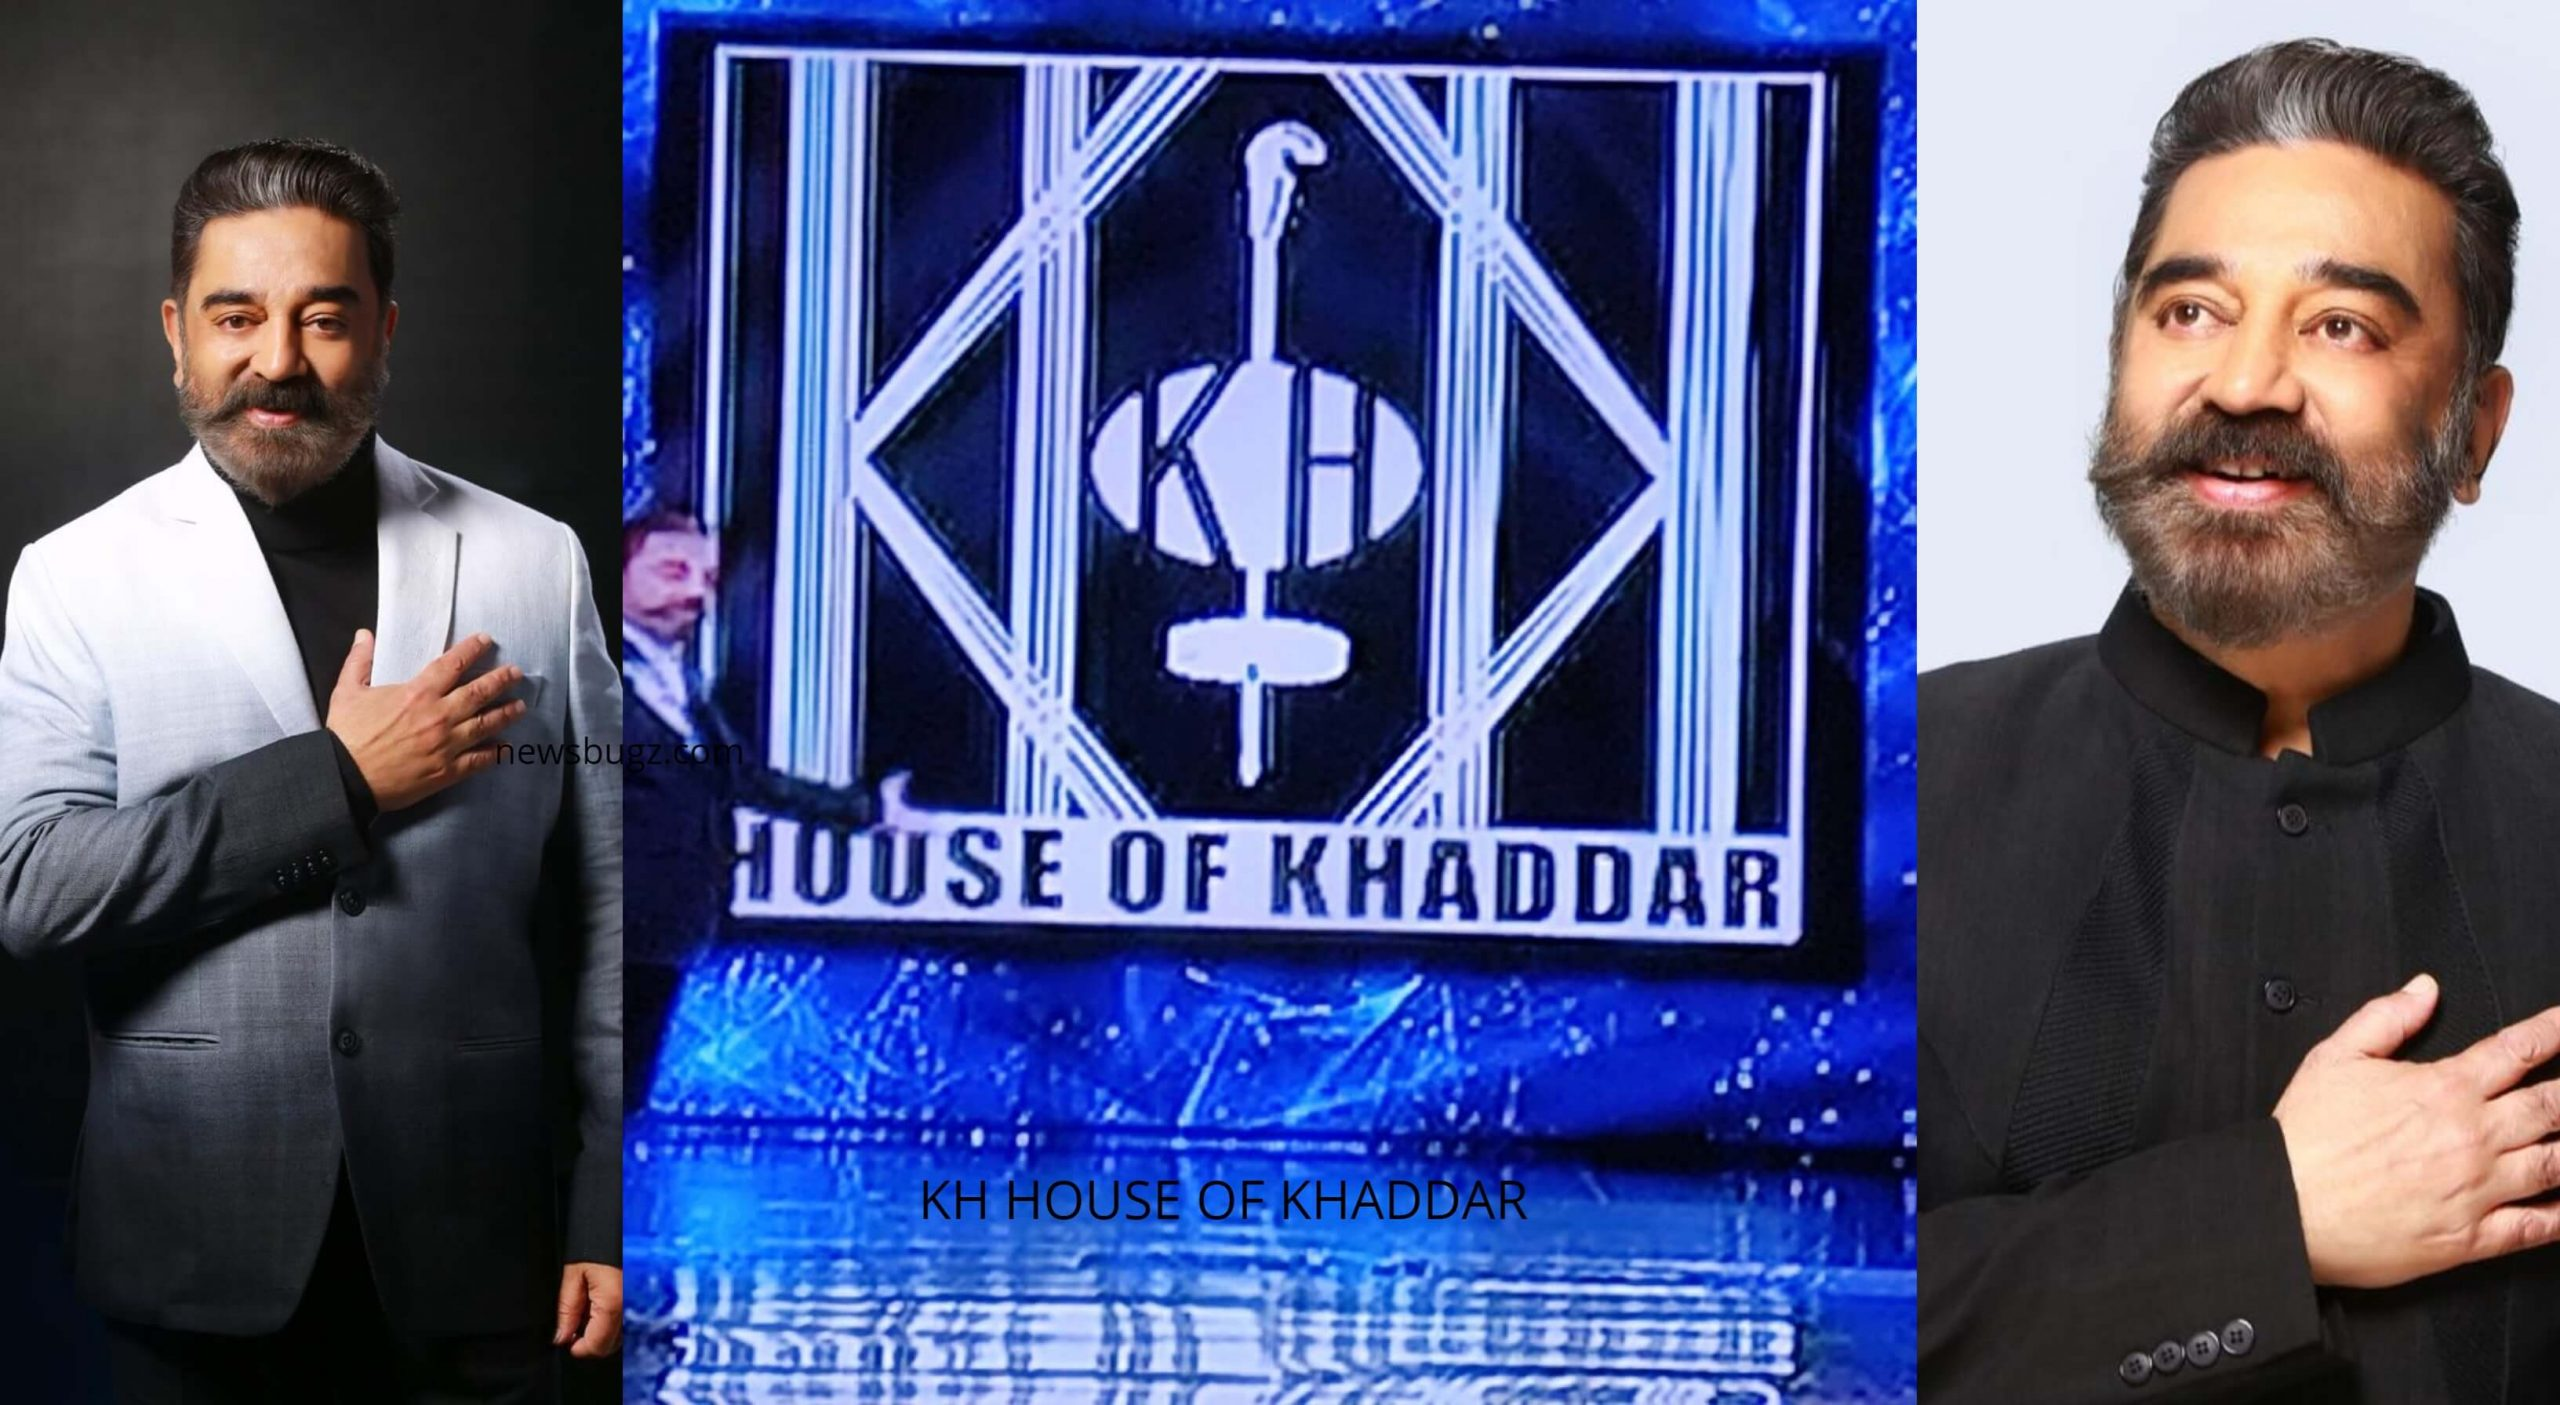 house of khaddar